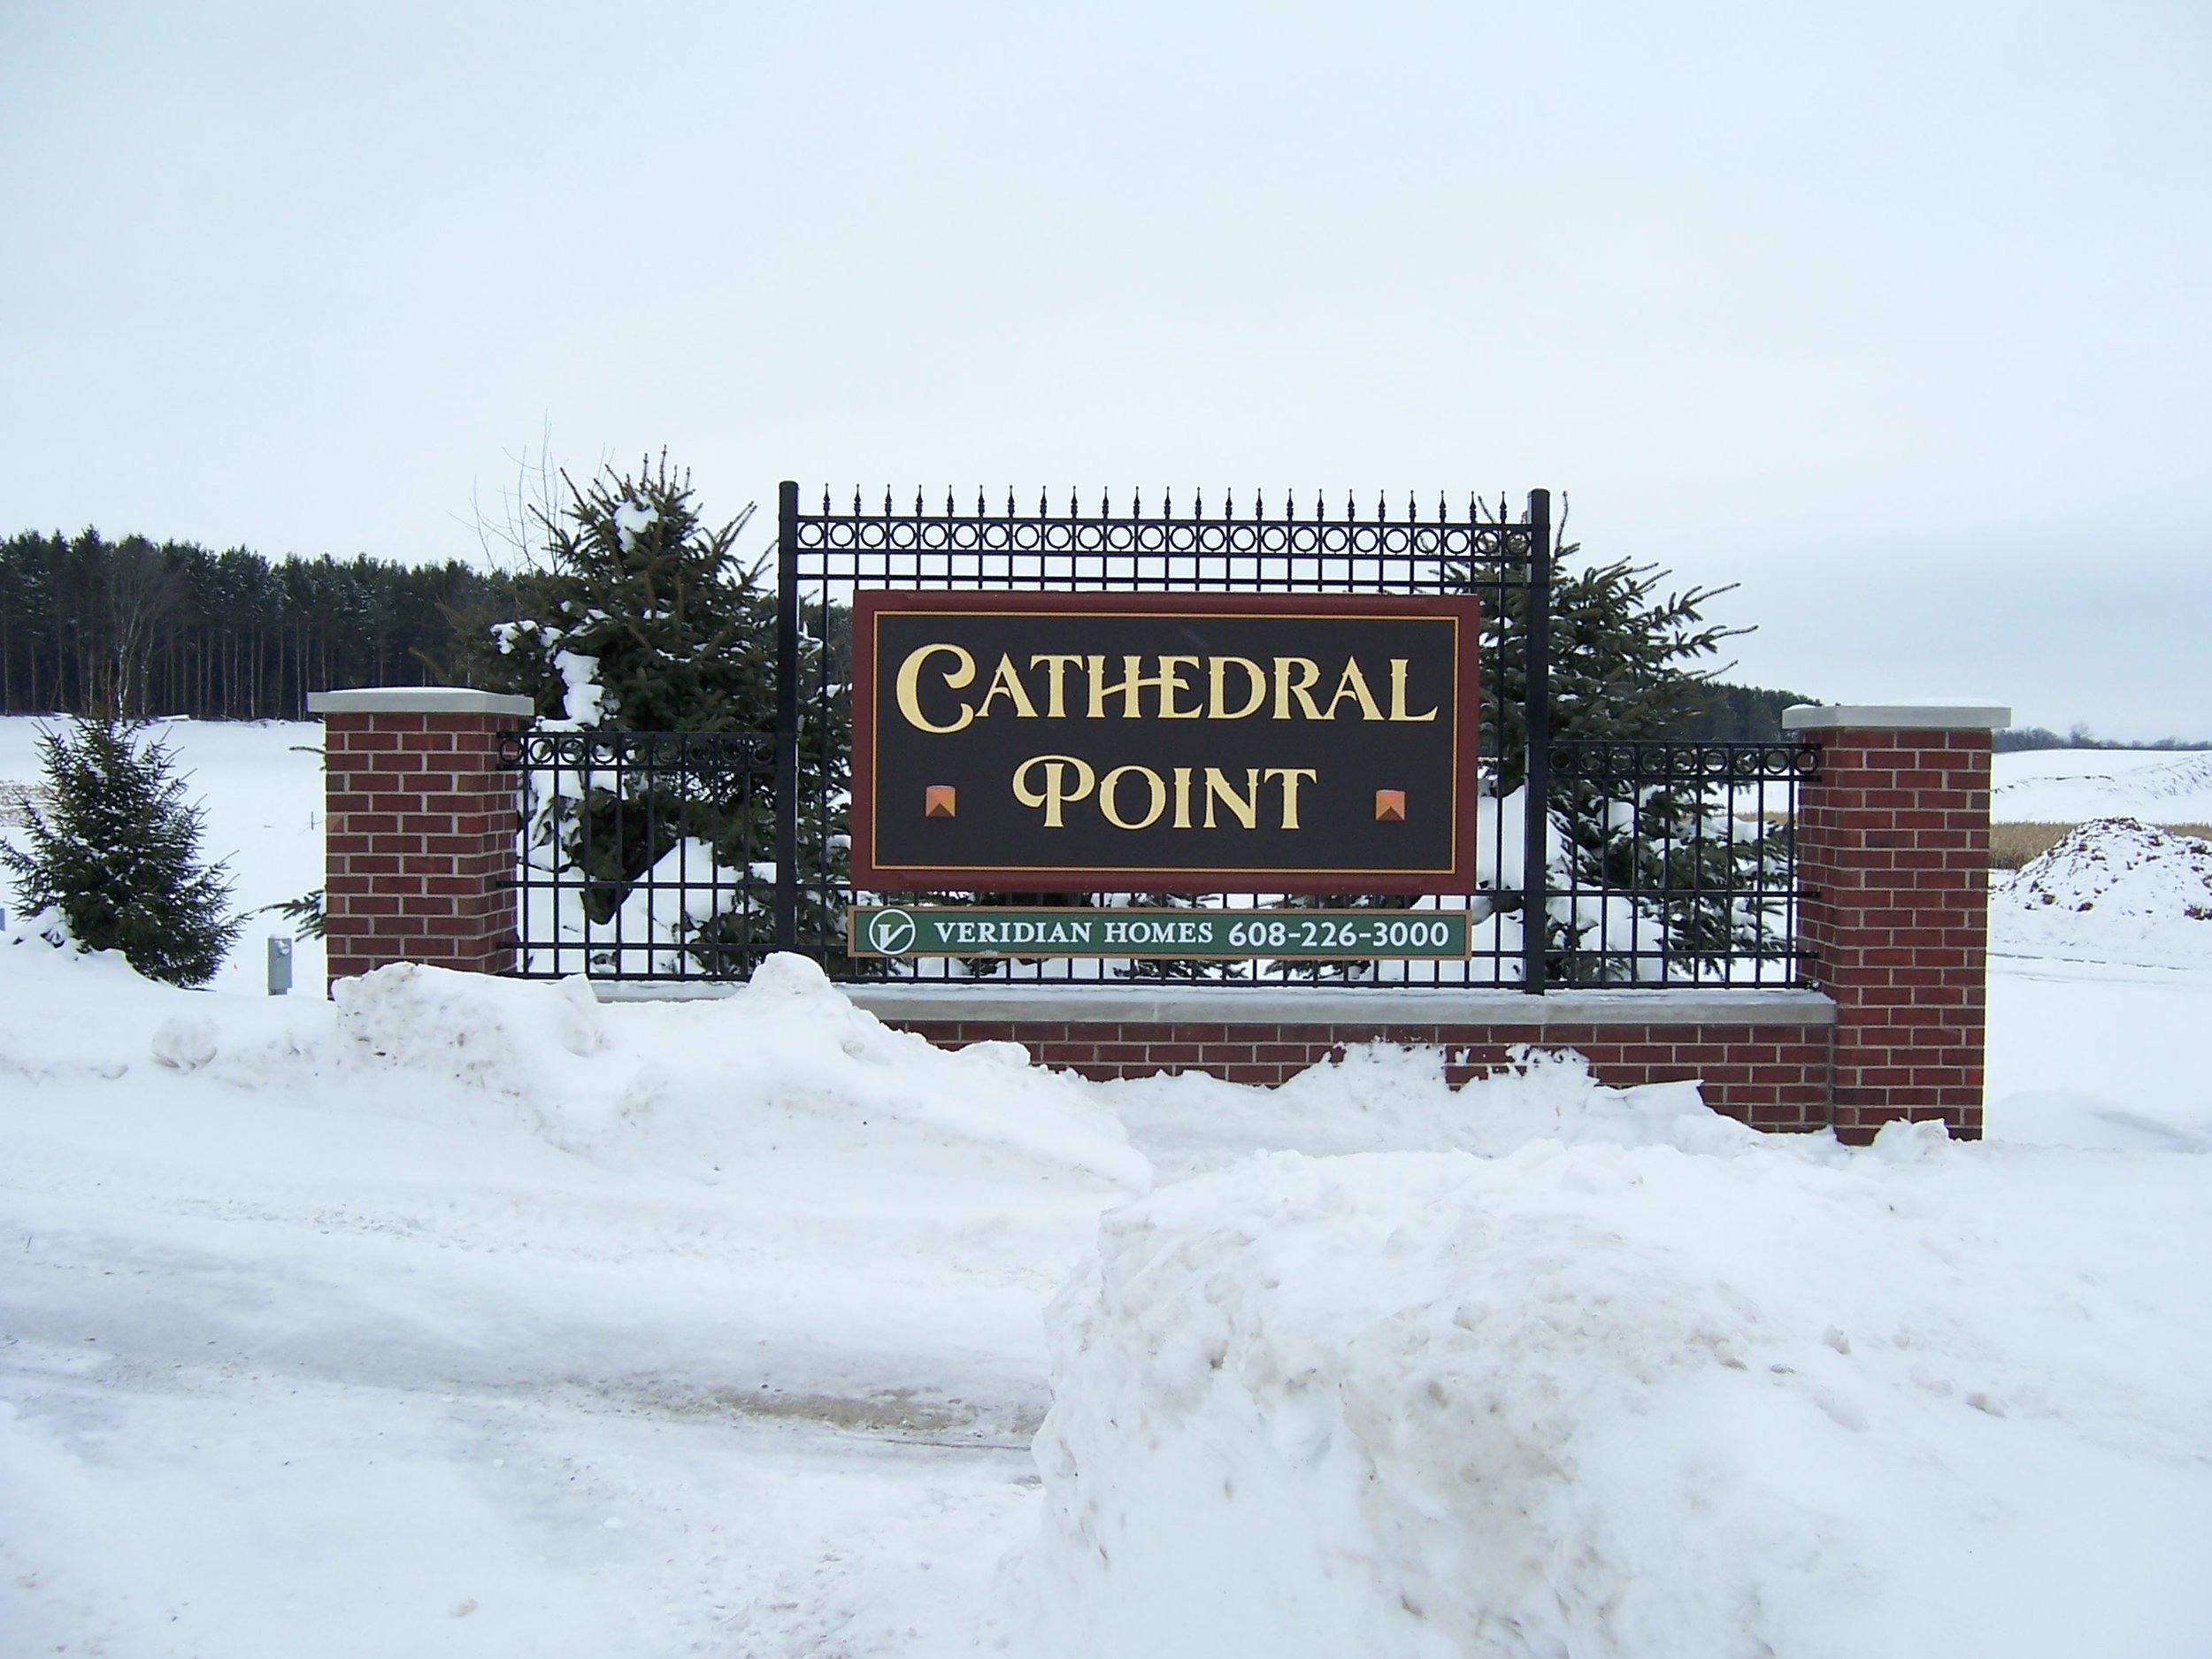 Neighborhood_cathedral_point.JPG